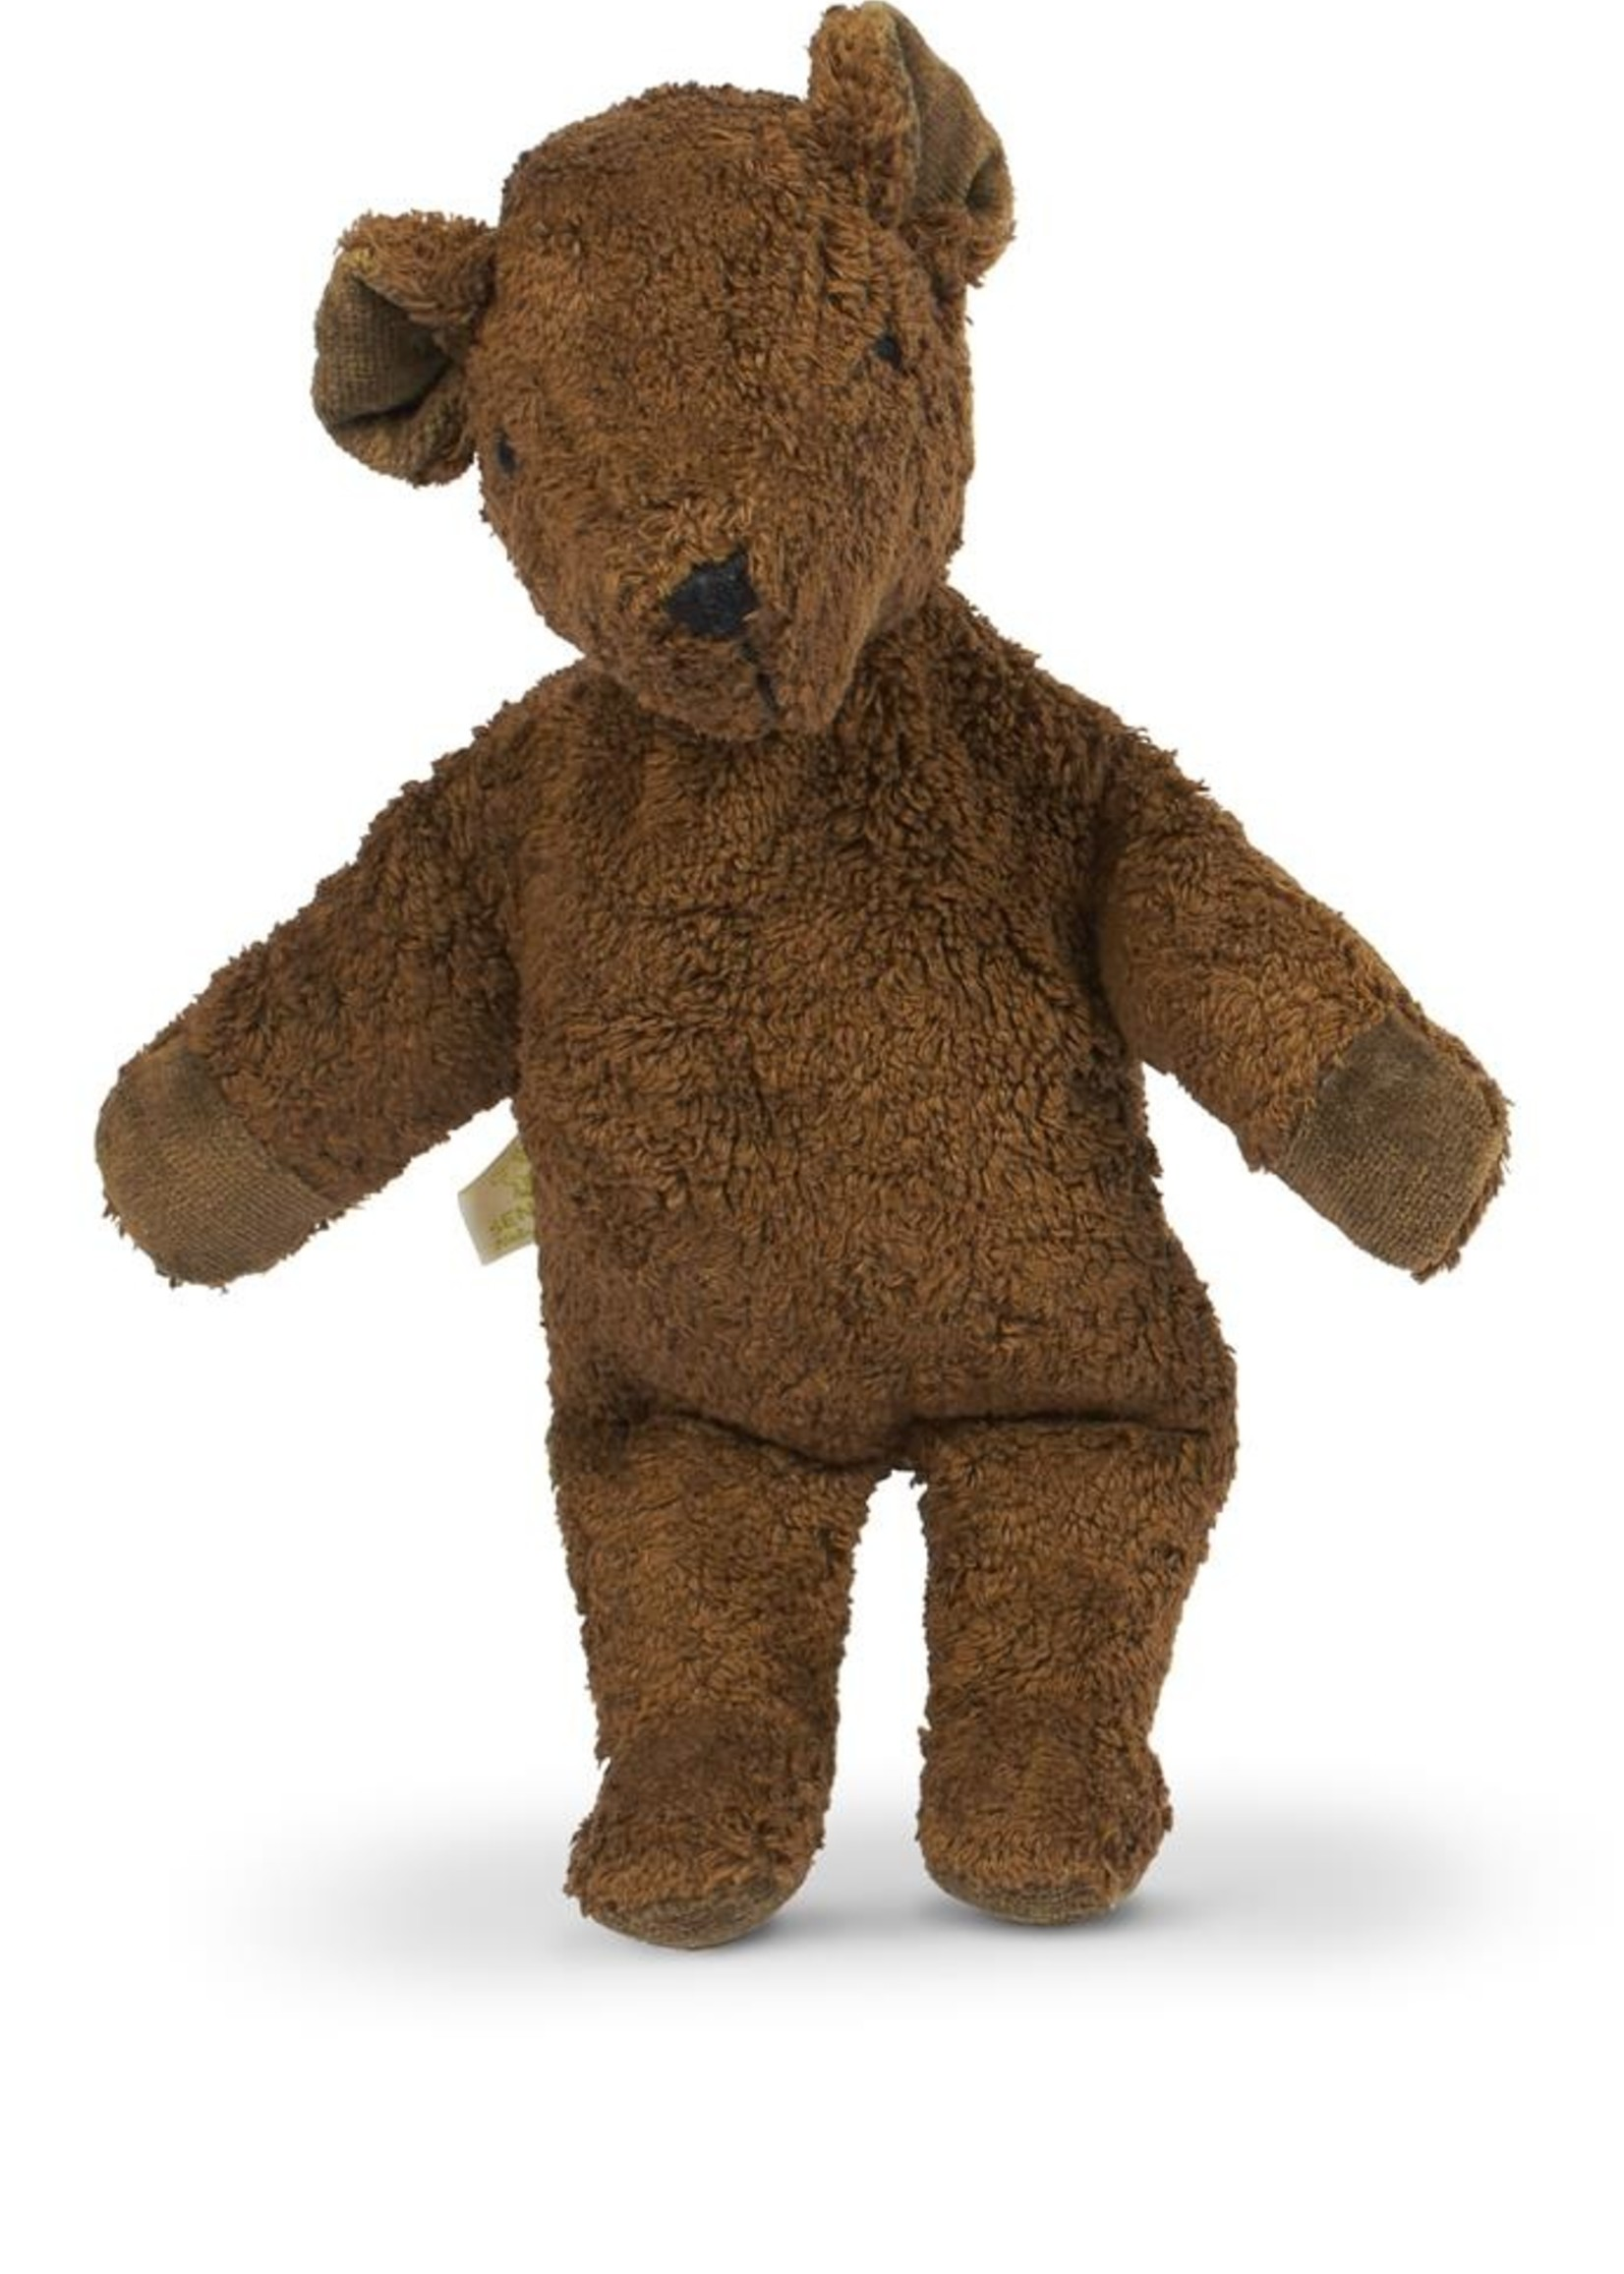 Senger Naturwelt Organic Cuddly Bear - Small - Brown